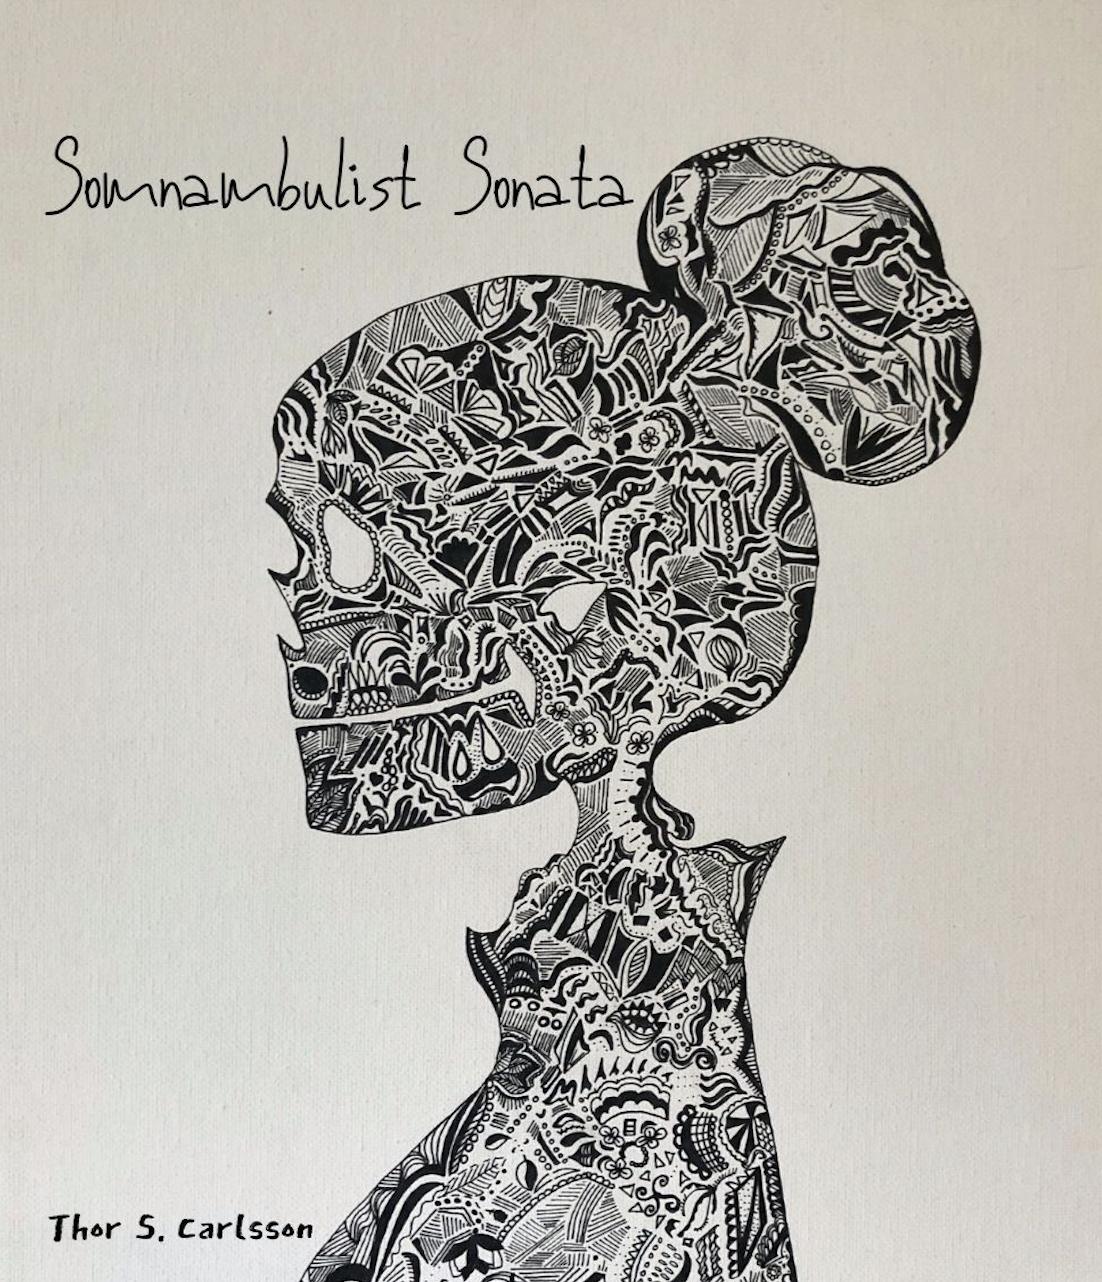 Somnambulist Sonata